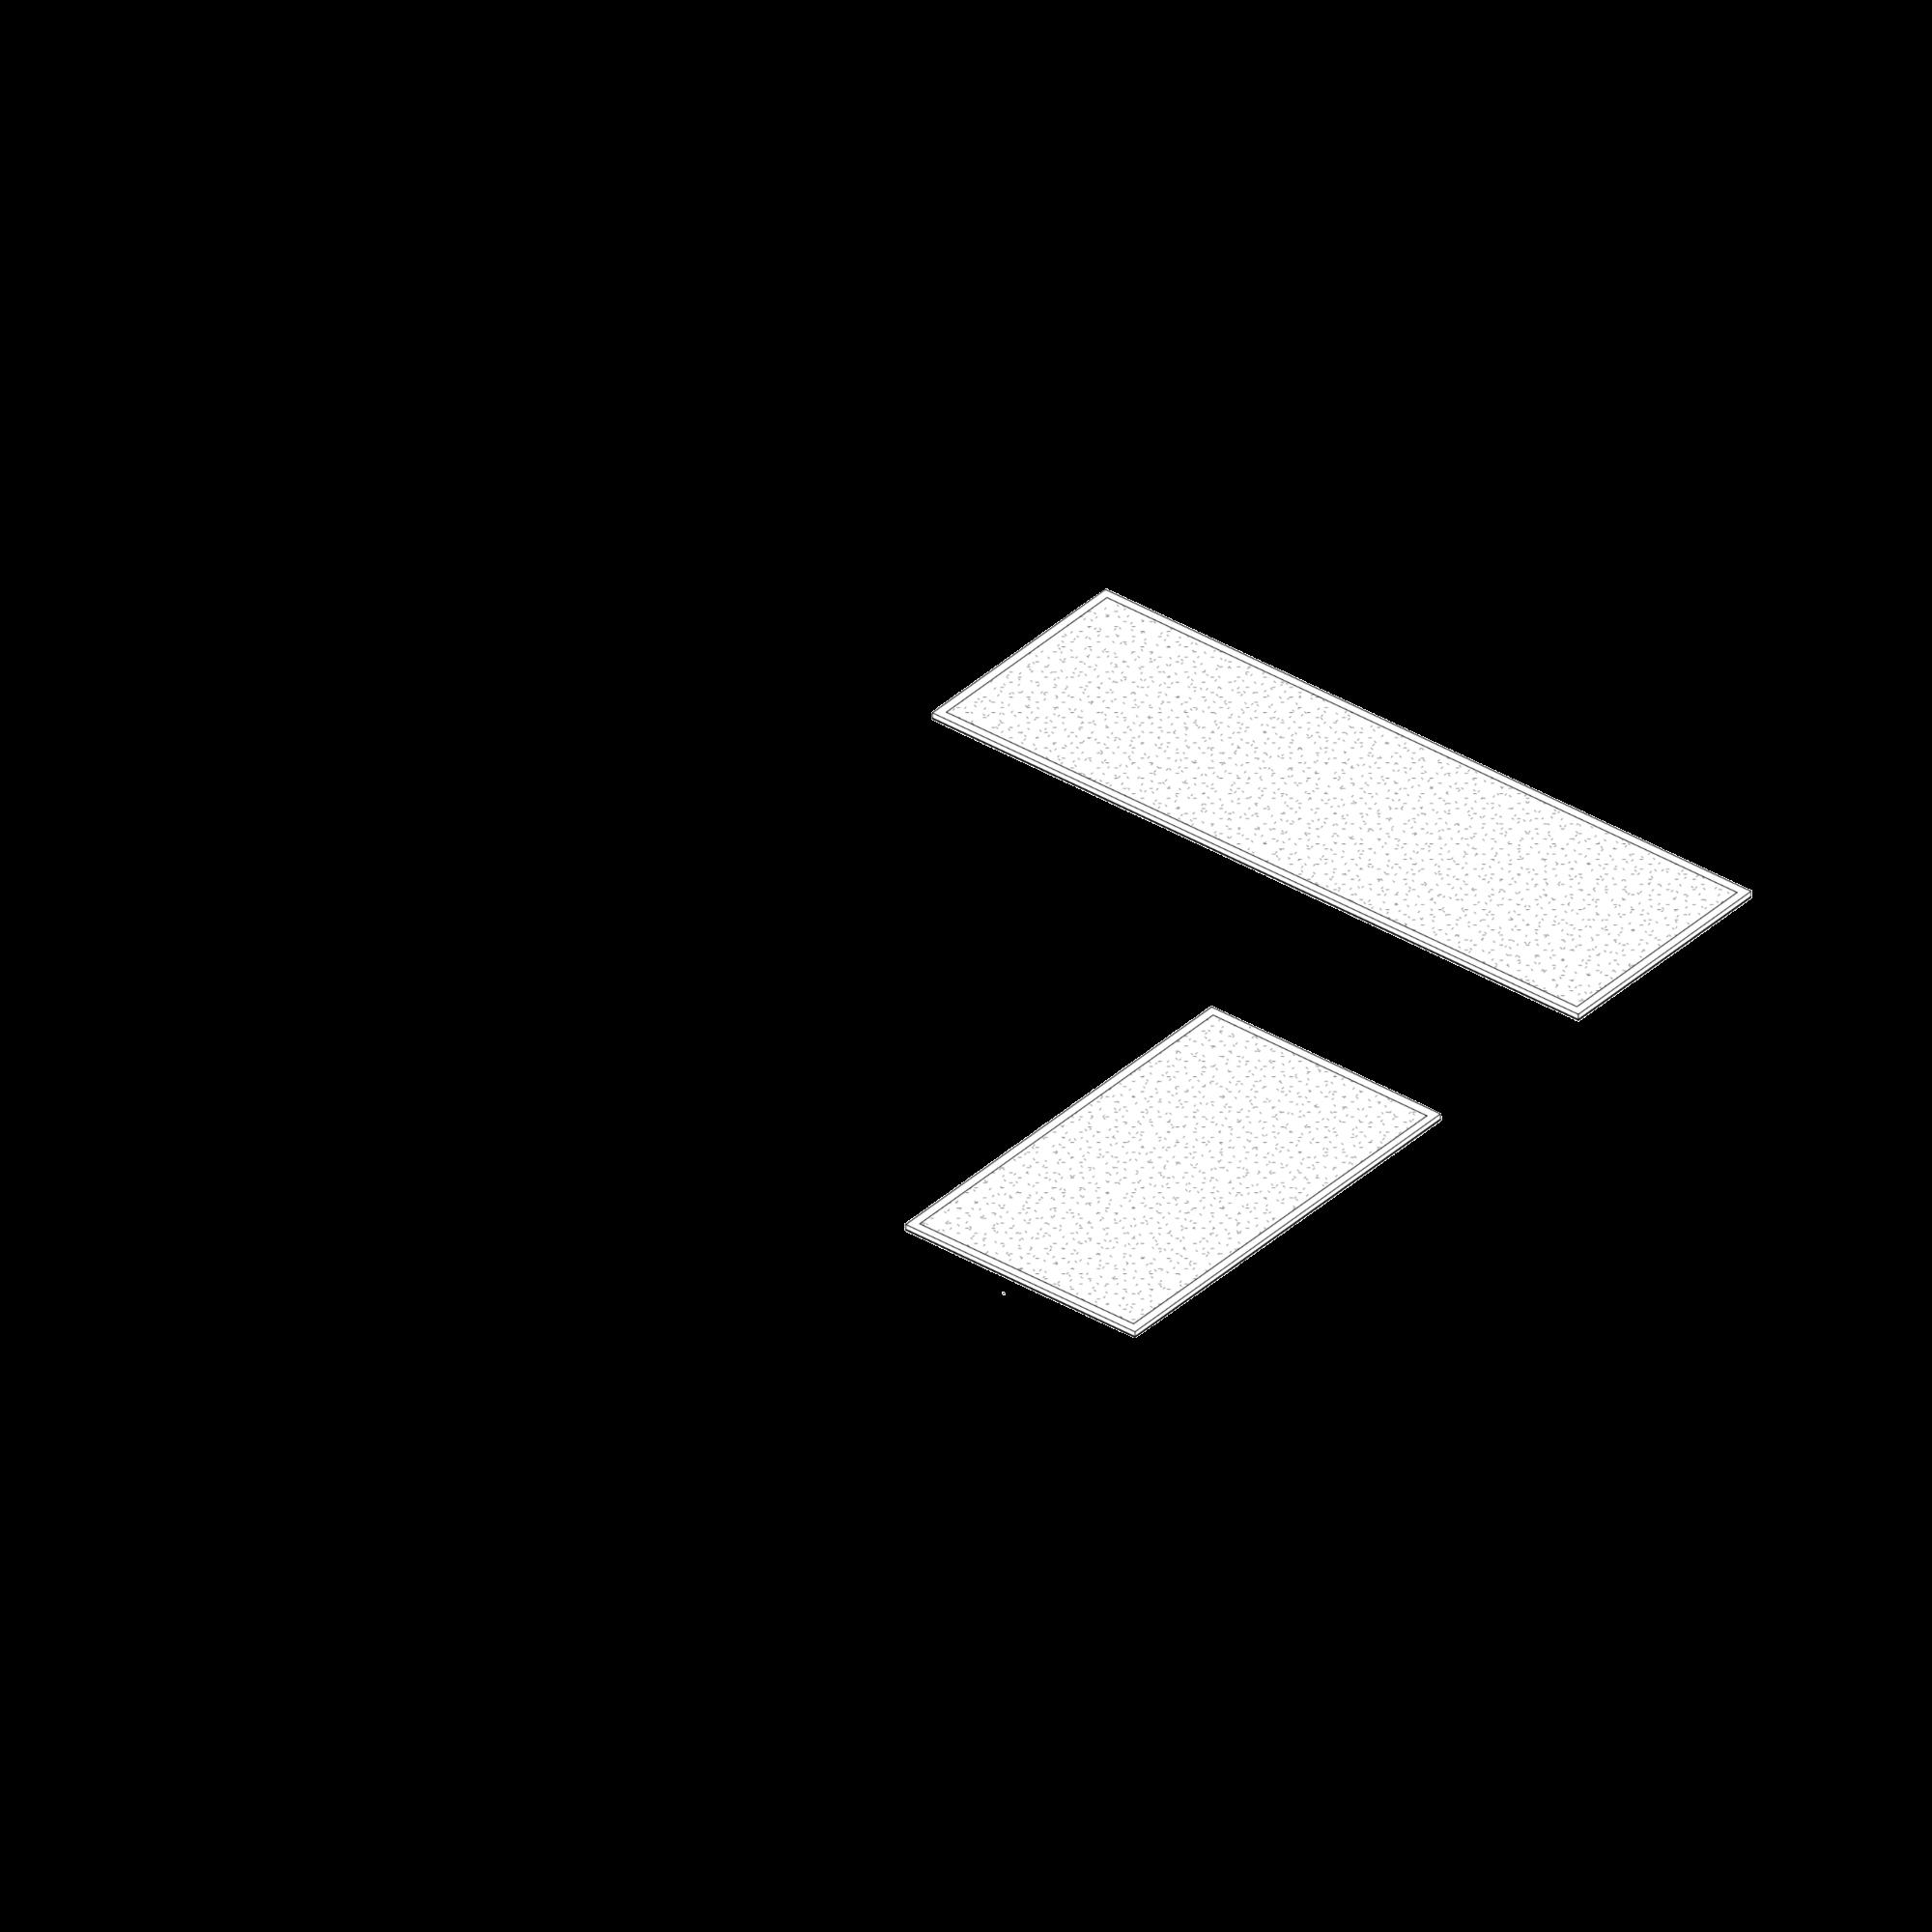 image 4.layer